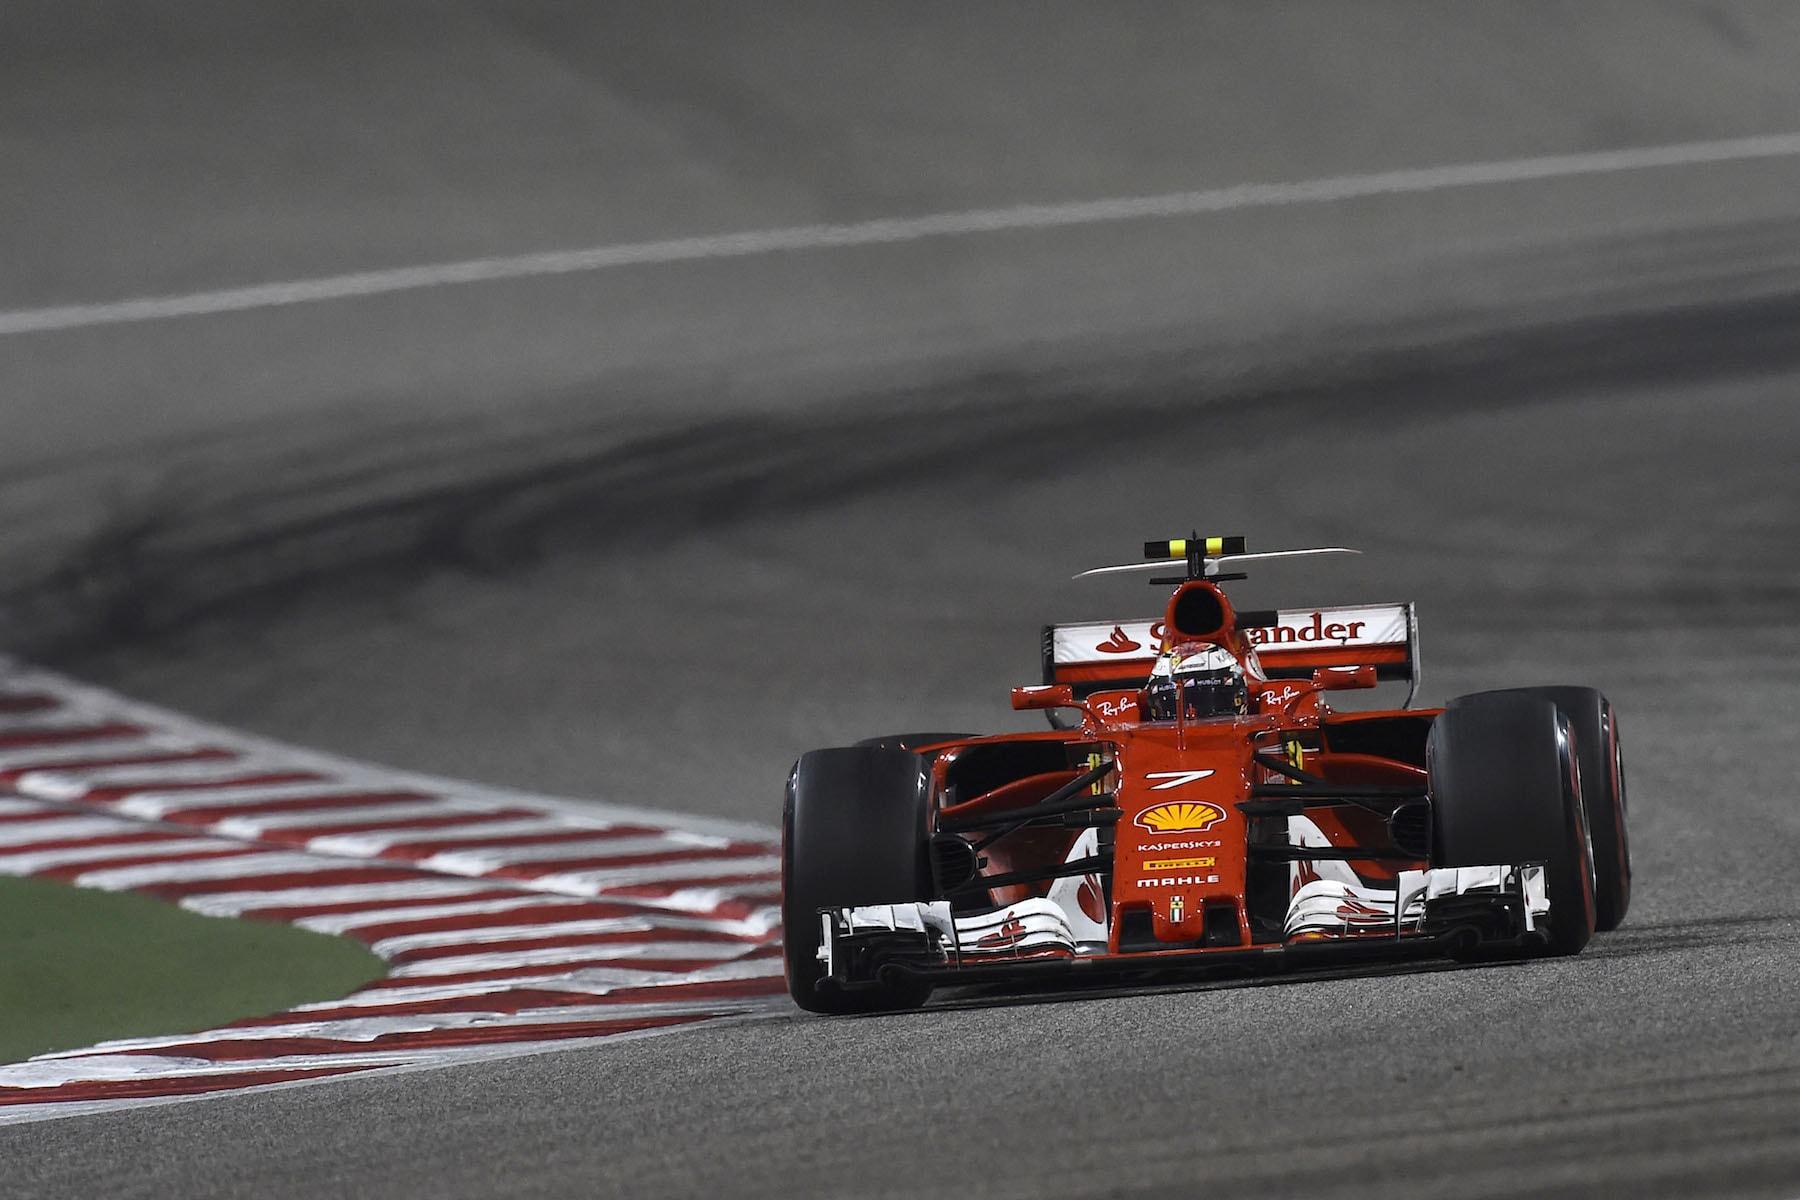 G 2017 Kimi Raikkonen   Ferrari SF70H   2017 Bahrain GP P4 1 copy.jpg